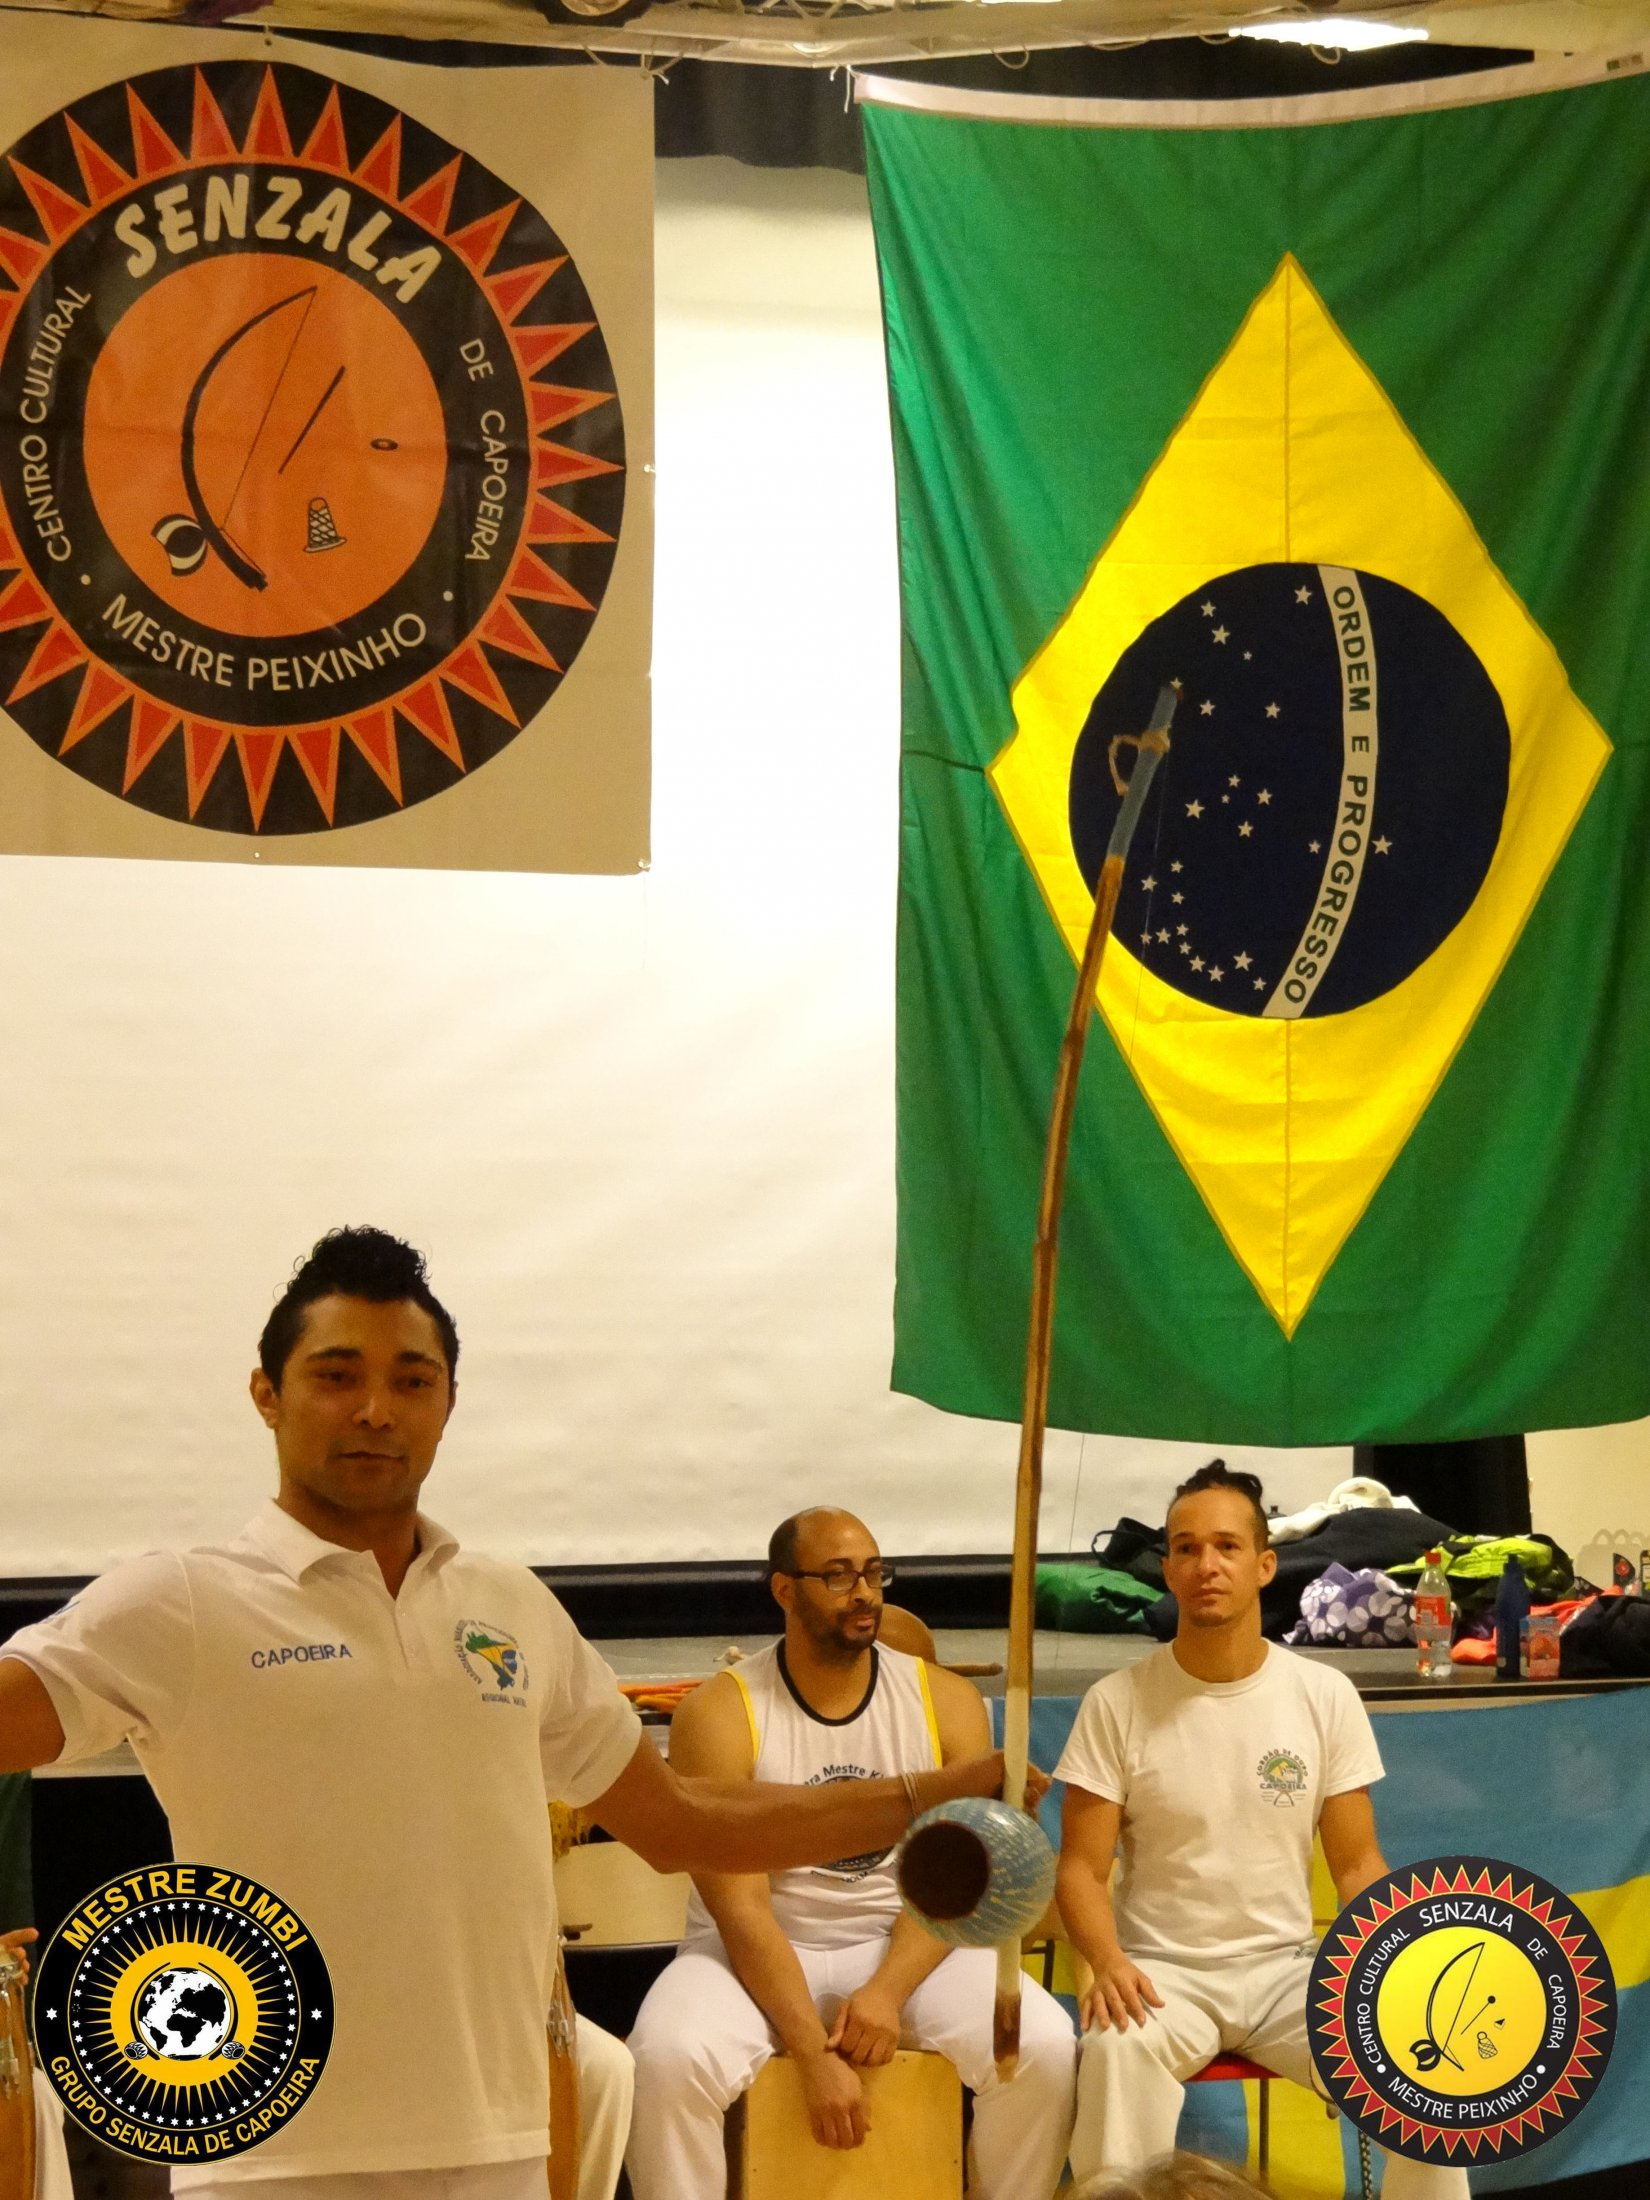 2013-12-14 - Capoeira 030